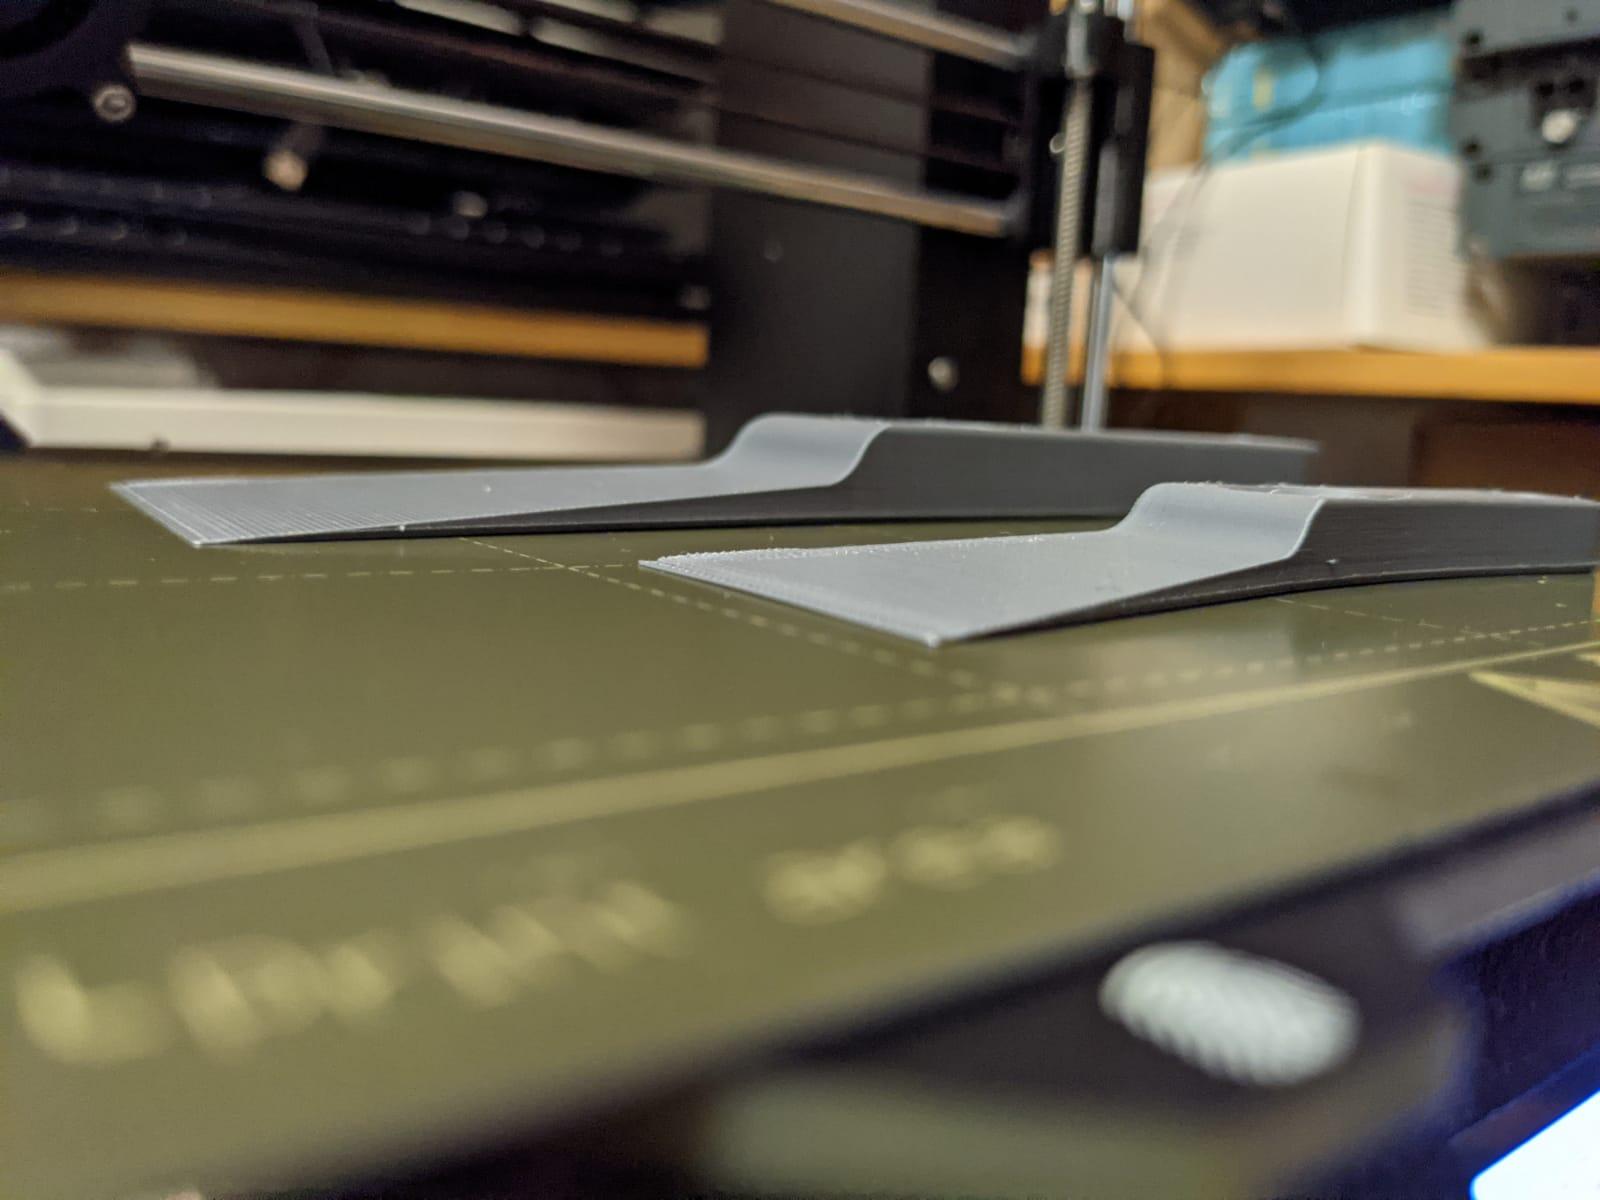 Fertig gedruckte Spachtel